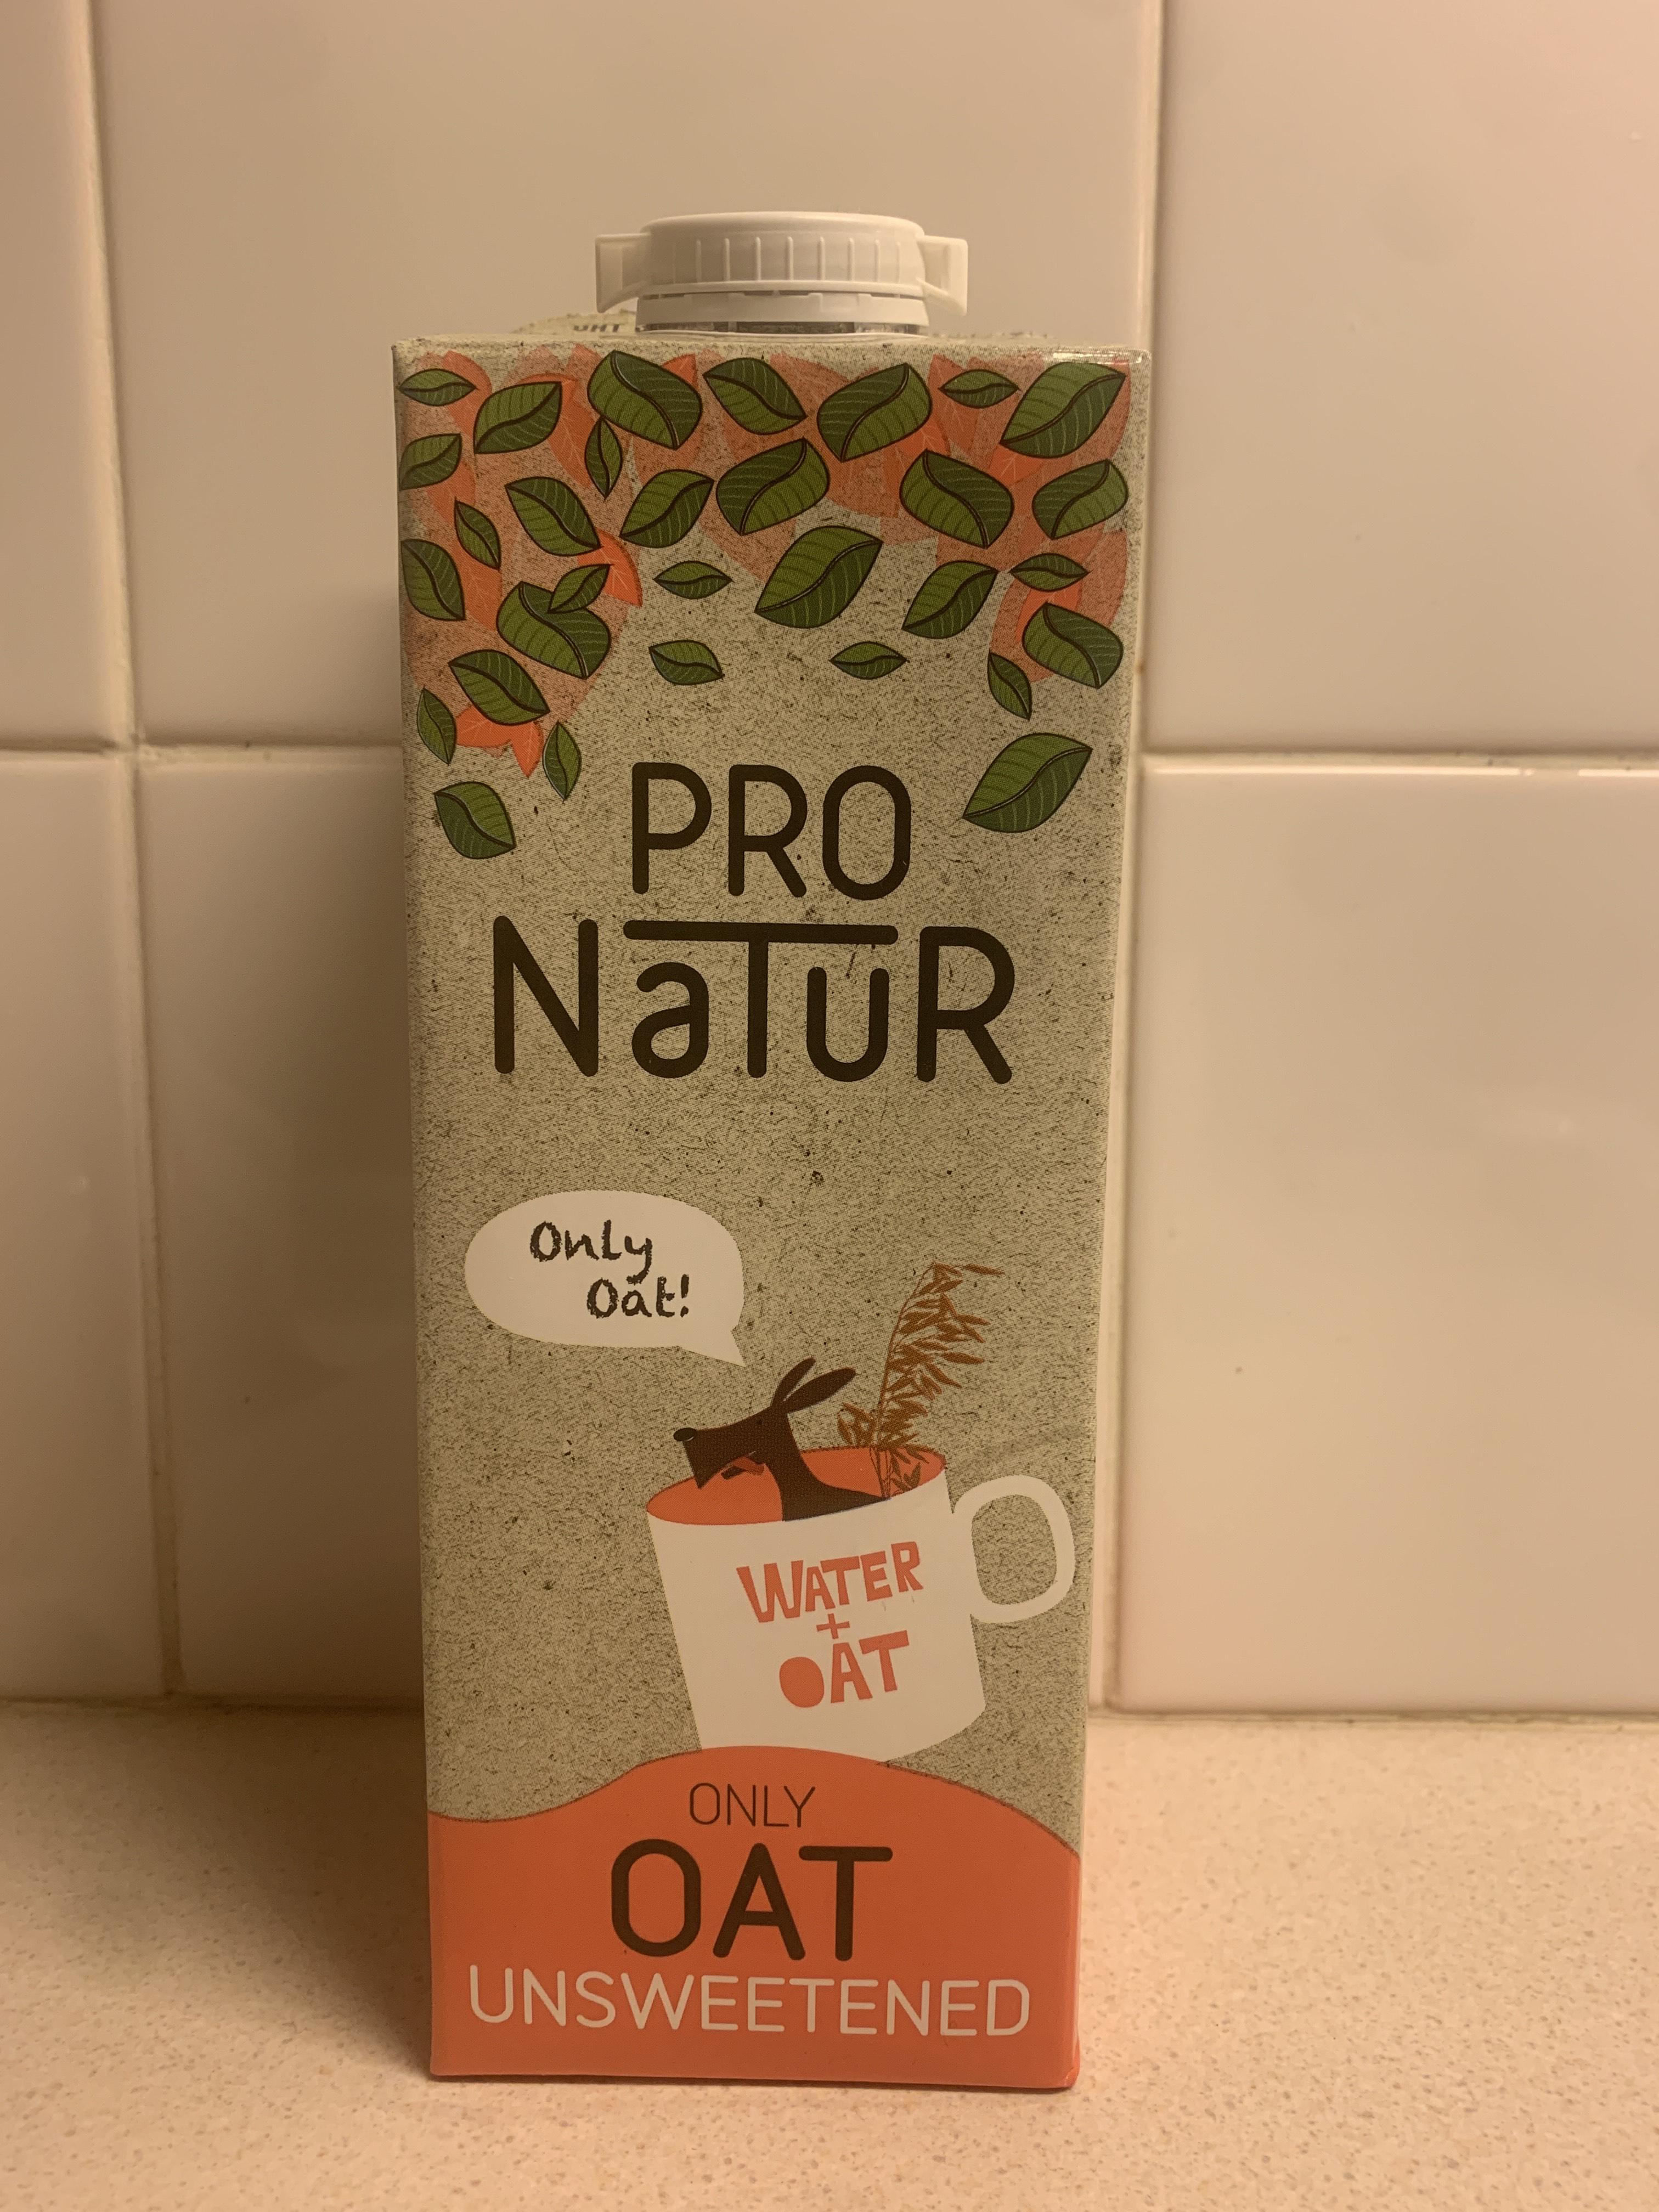 Pro Natur unsweetened Oat drink 89p @ Aldi